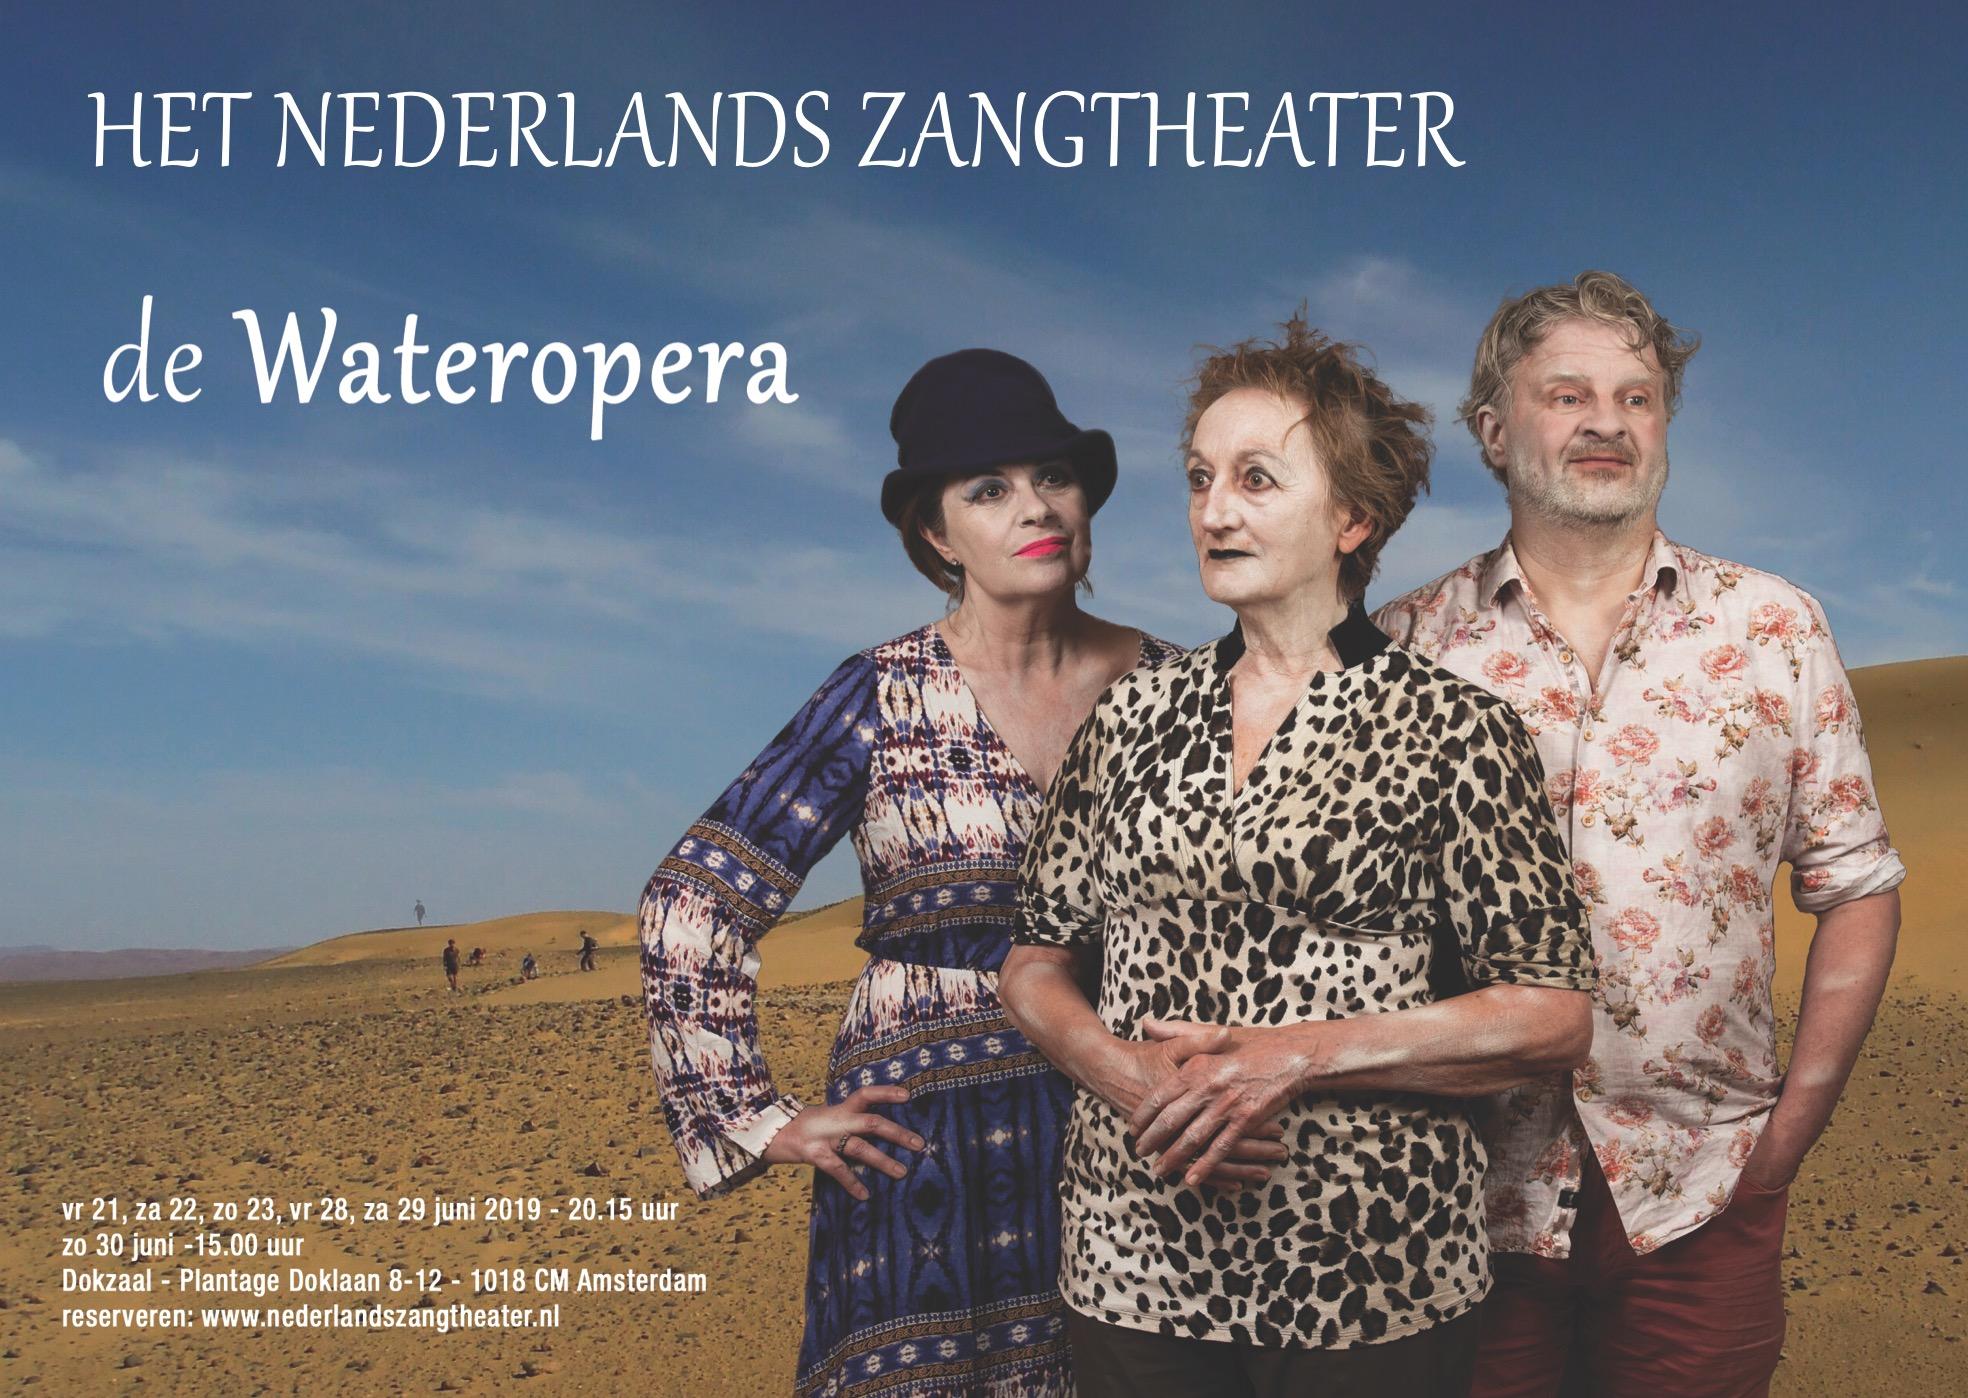 De Wateropera – Nederlands Zangtheater in de Dokzaal